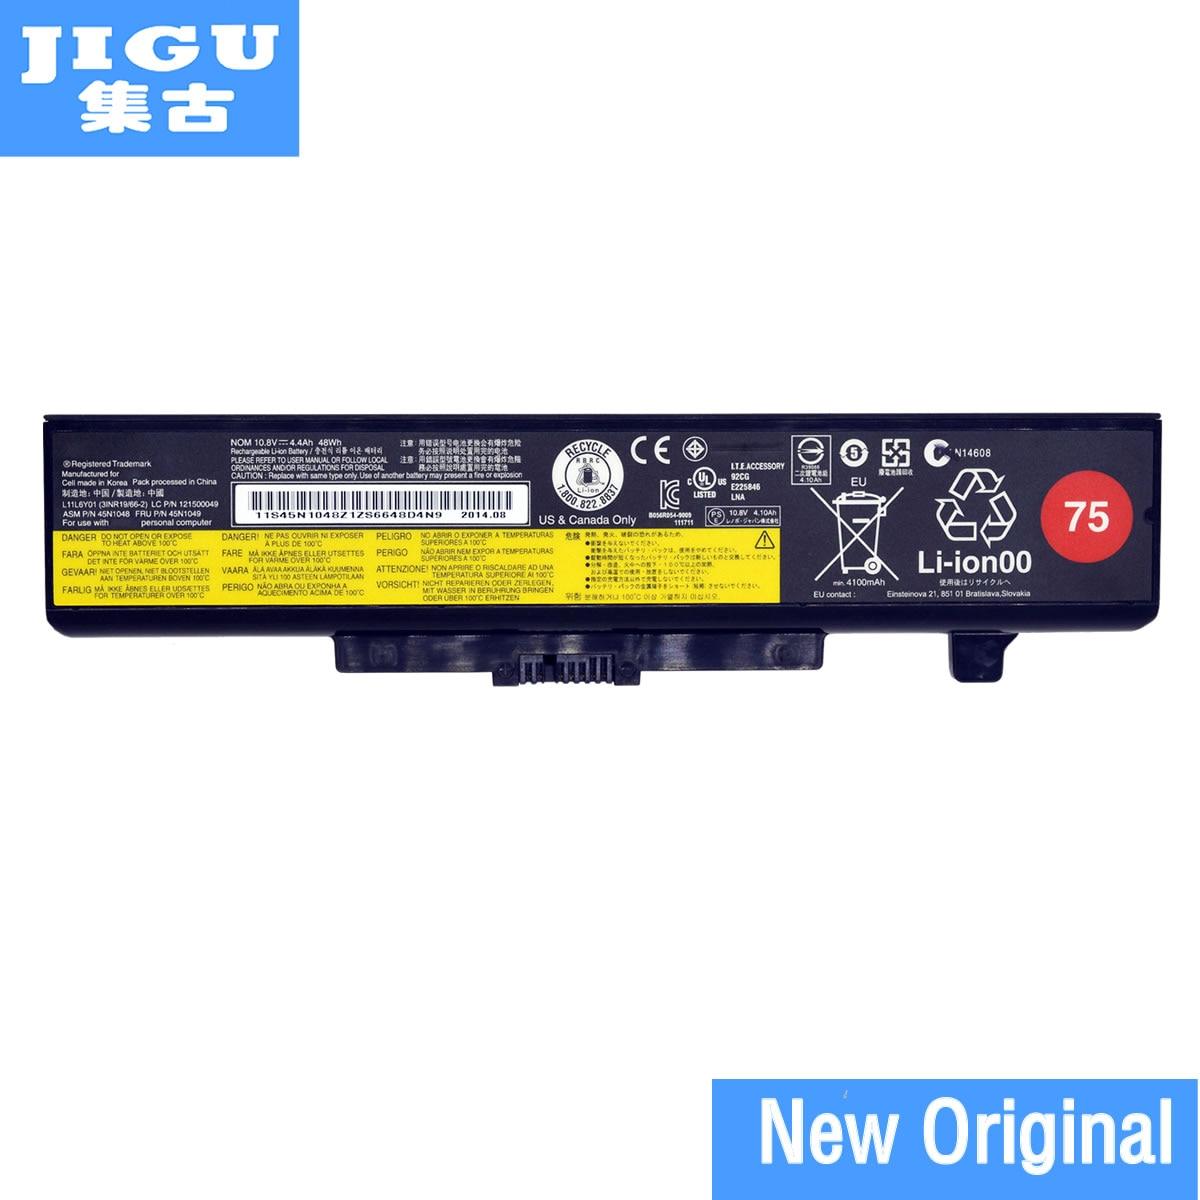 Bateria Original Para lenovo Para IdeaPad y485p Y480 JIGU B590 G710 N581 G700 P585 B490 Series Para ThinkPad E540 E440 e531 E431